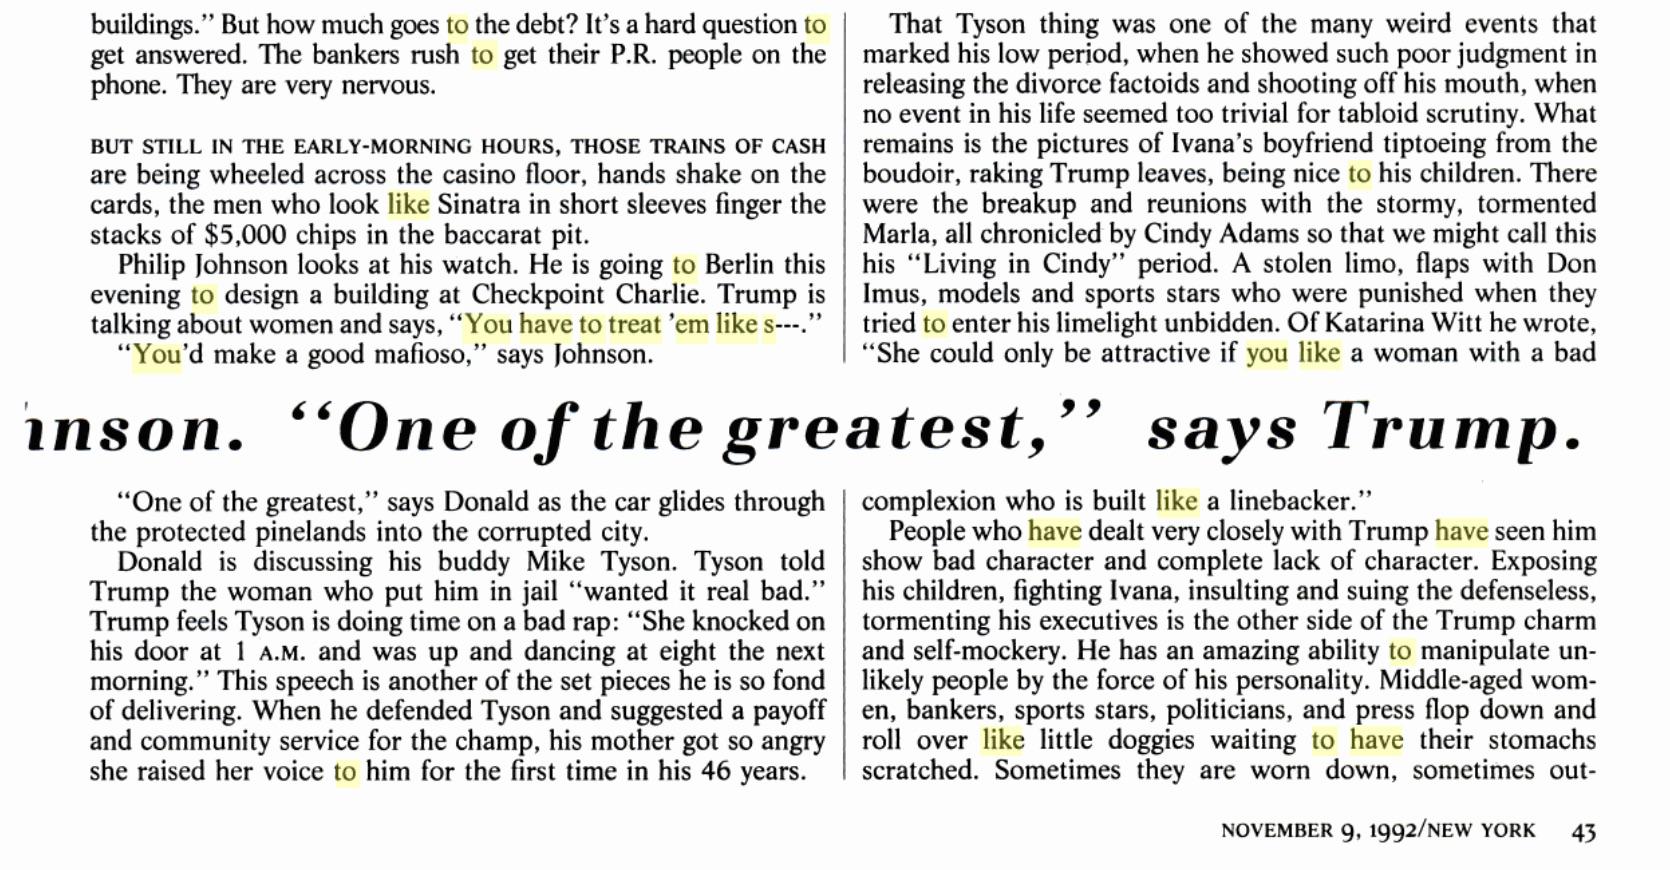 women you have to treat em like shit trump 1992 new york magazine